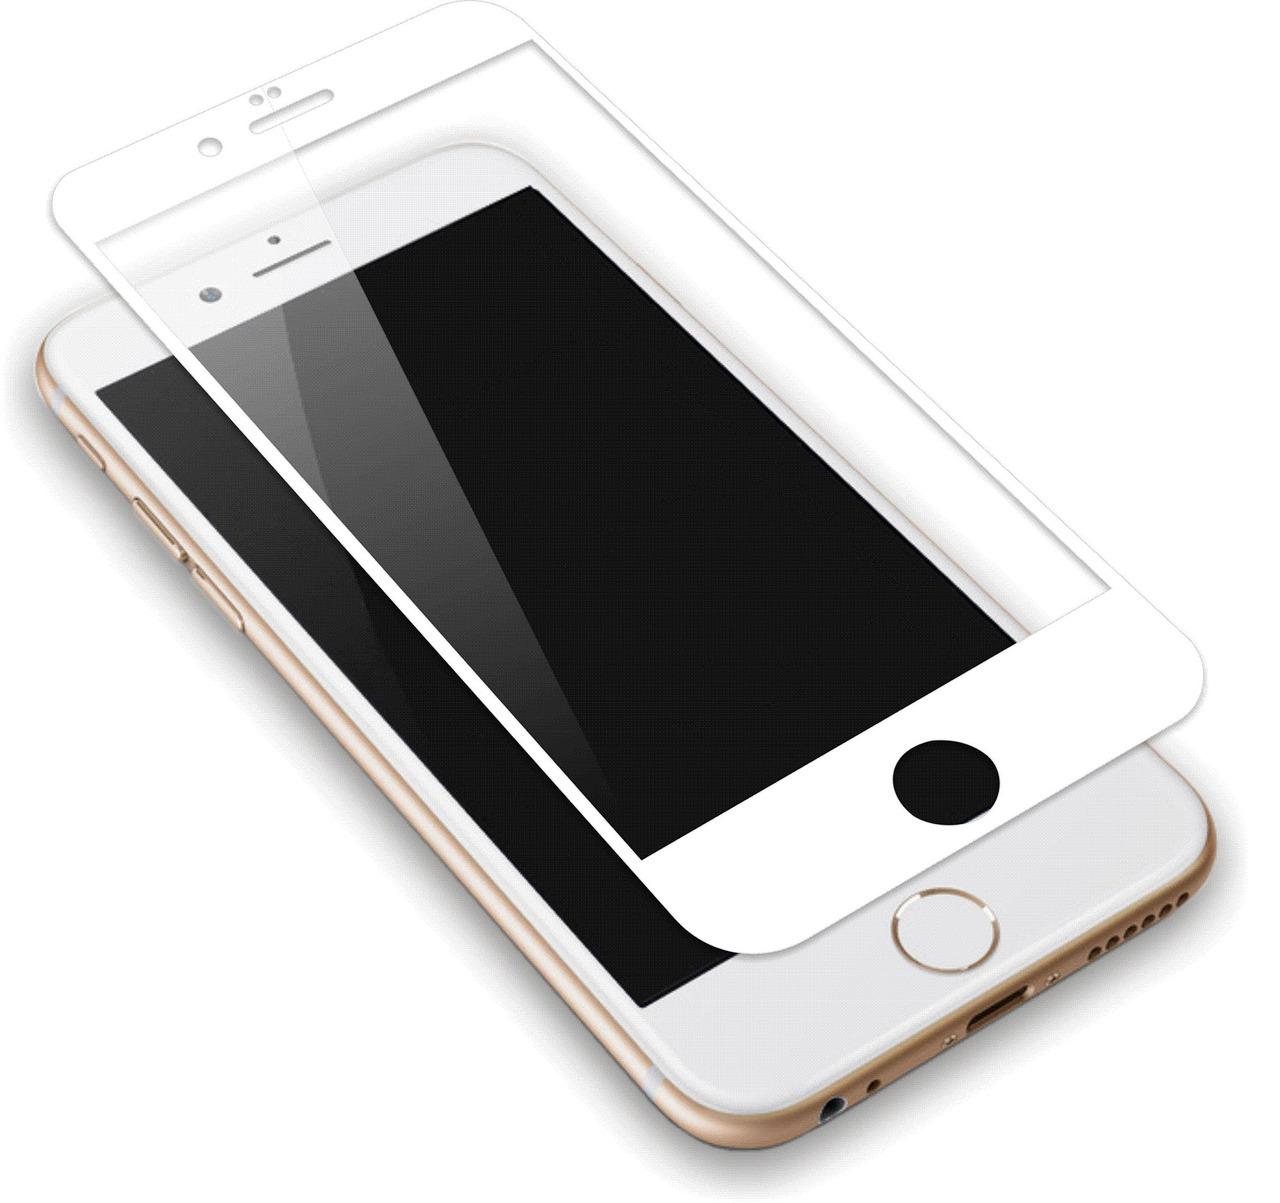 Tempered Glass Iphone 6 Plus 6s White Discoazulcom 4g 4s 5 5s 5c